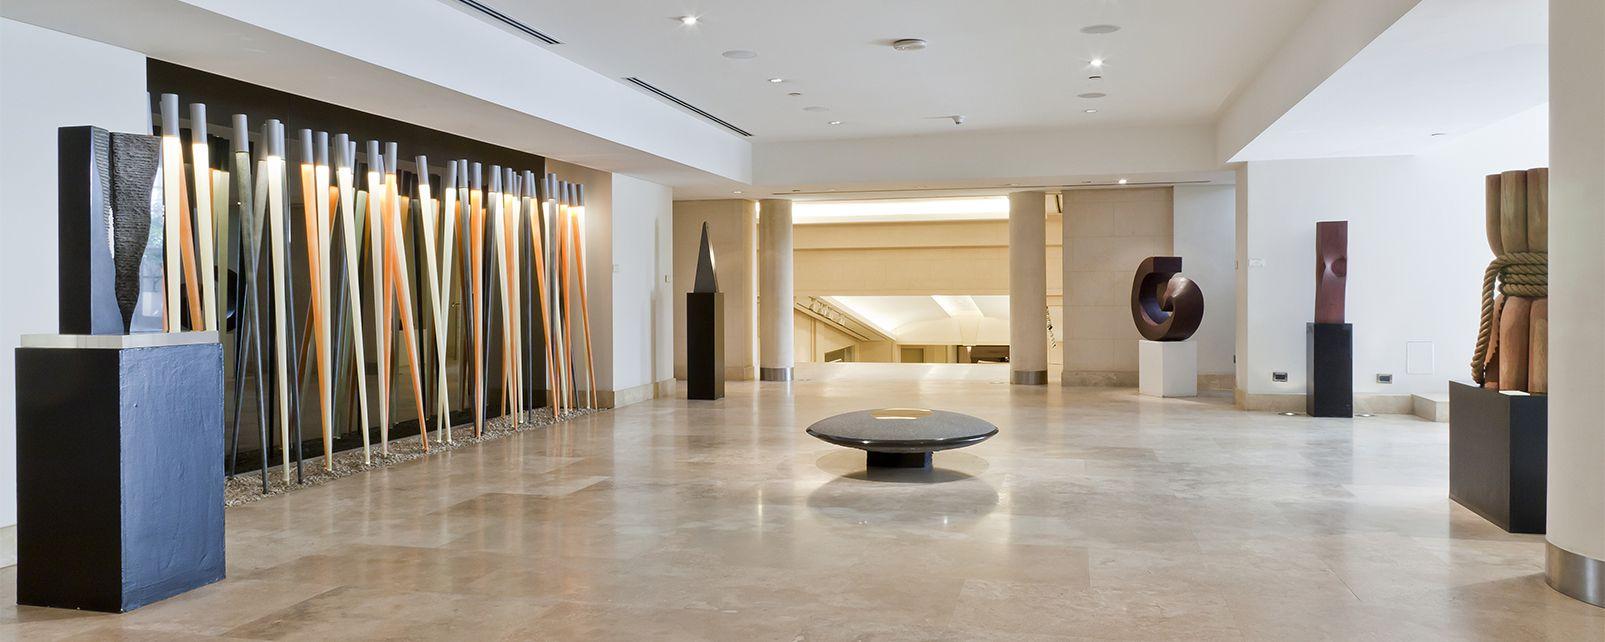 Hôtel Palacio Duhau - Park Hyatt Buenos Aires